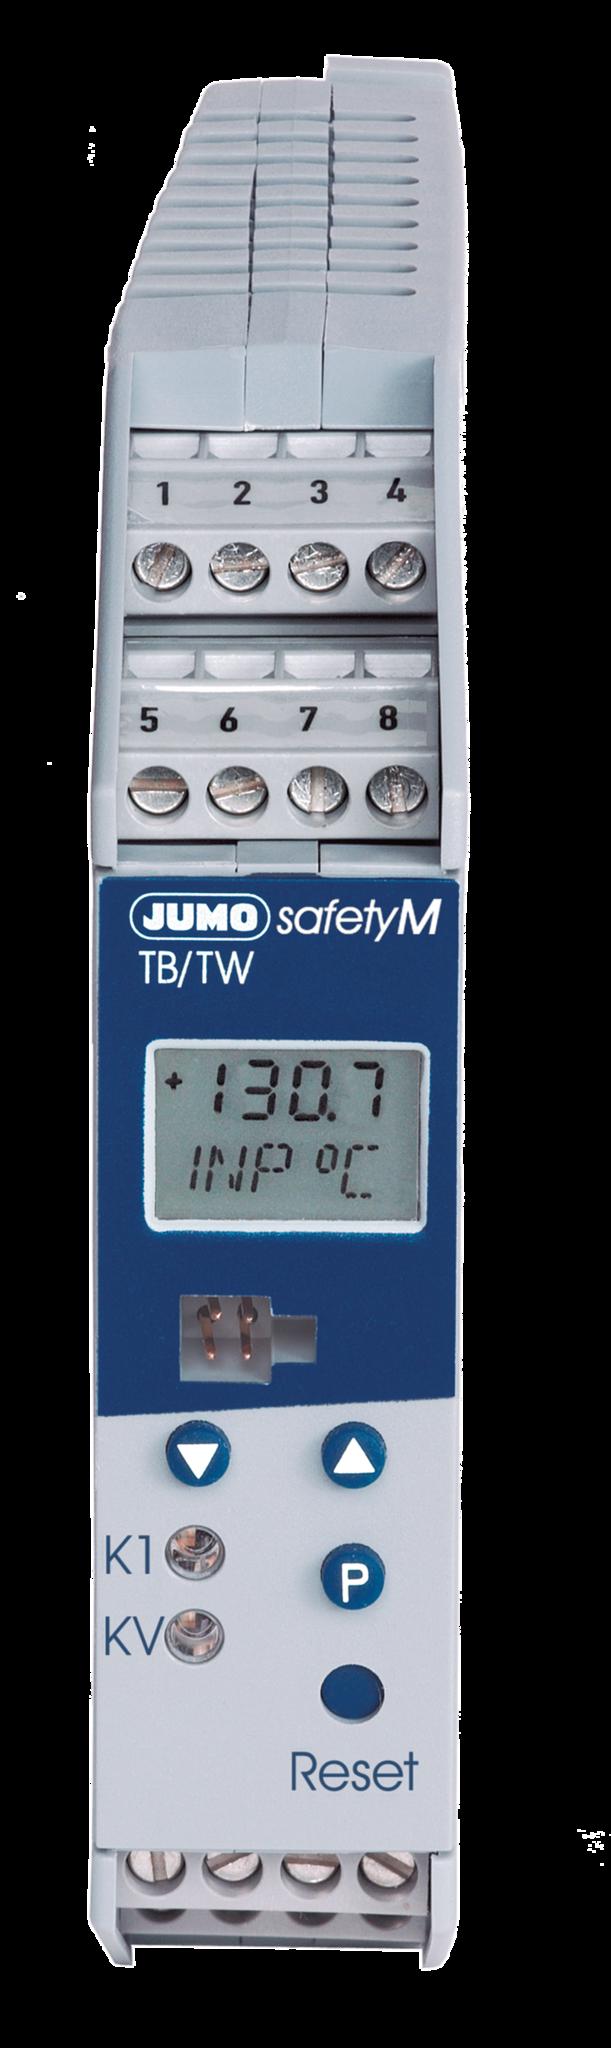 JUMO safetyM TB/TW